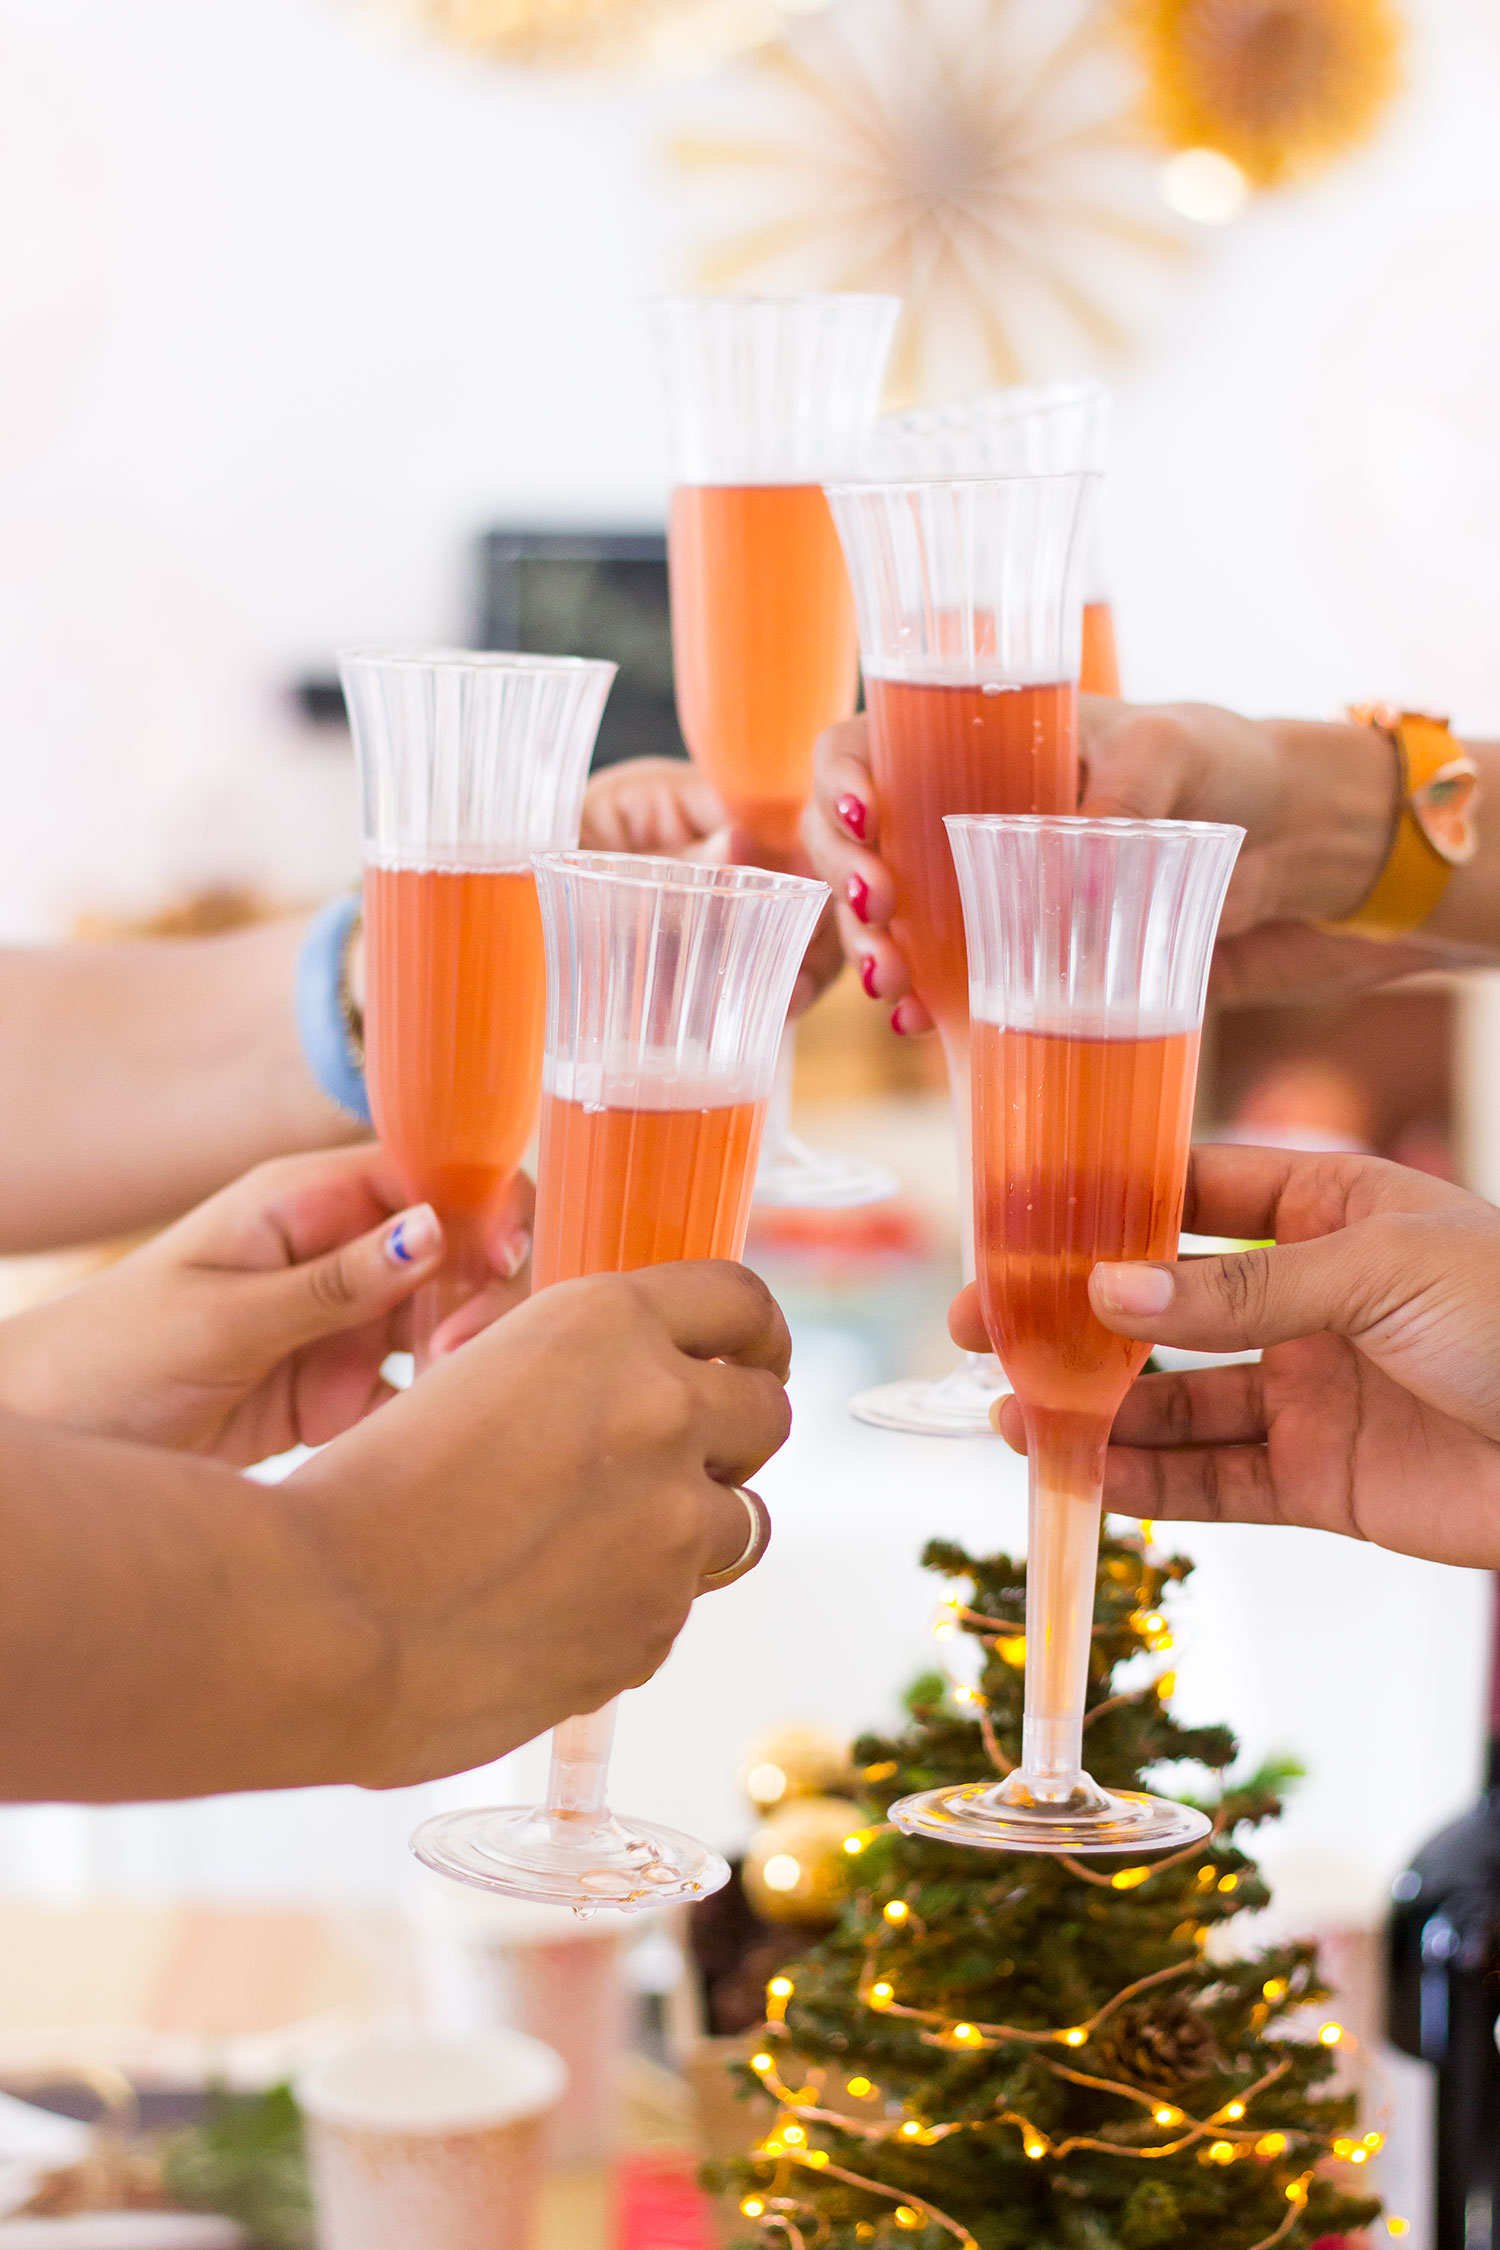 felices fiestas! -